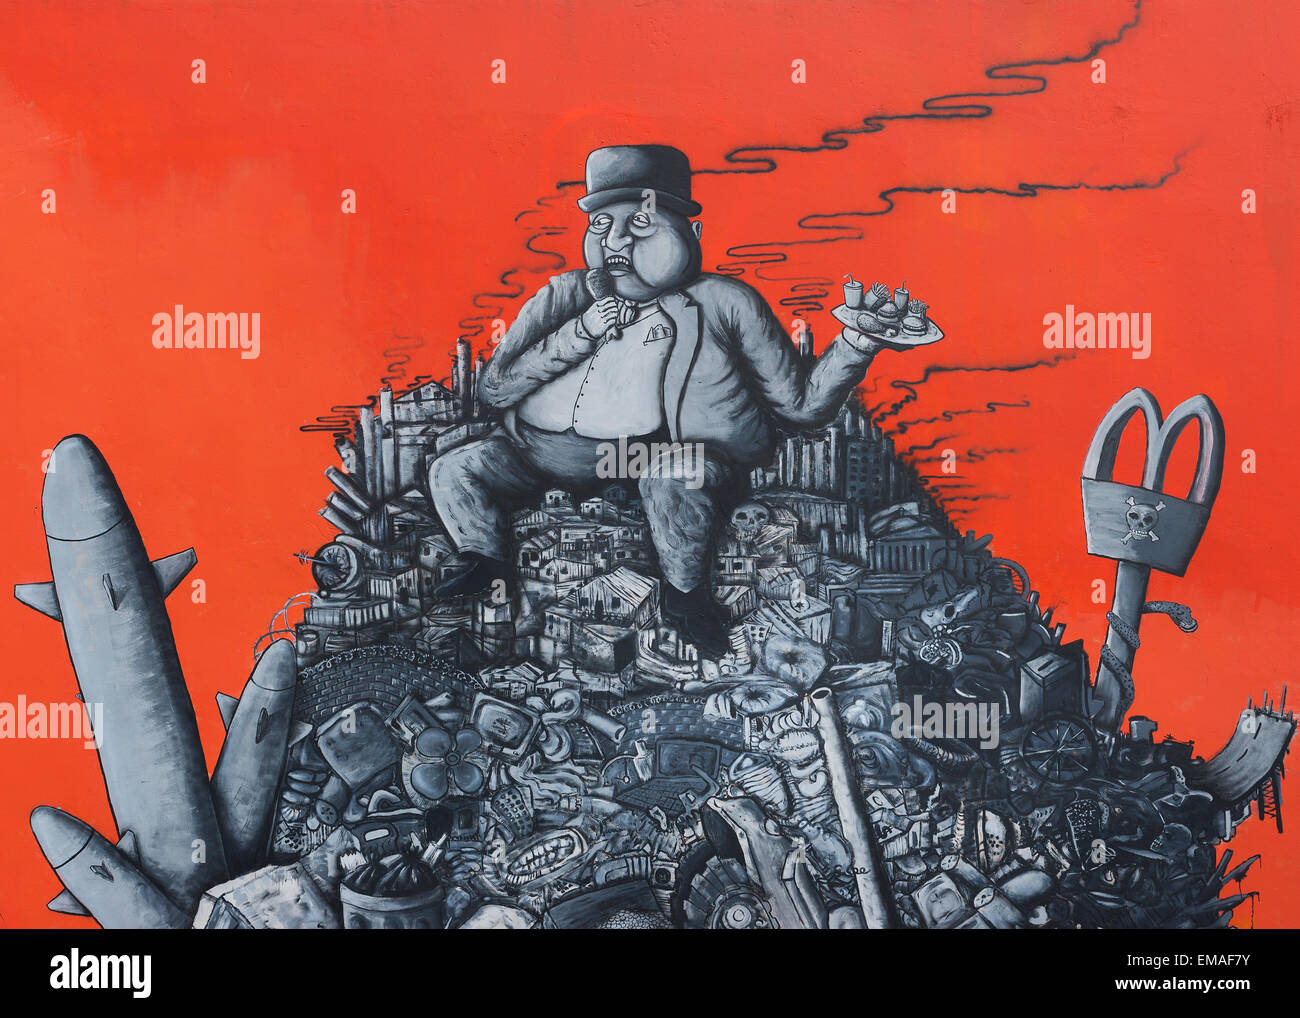 Graffiti: fat capitalist sitting on a heap of corporate junk. - Stock Image